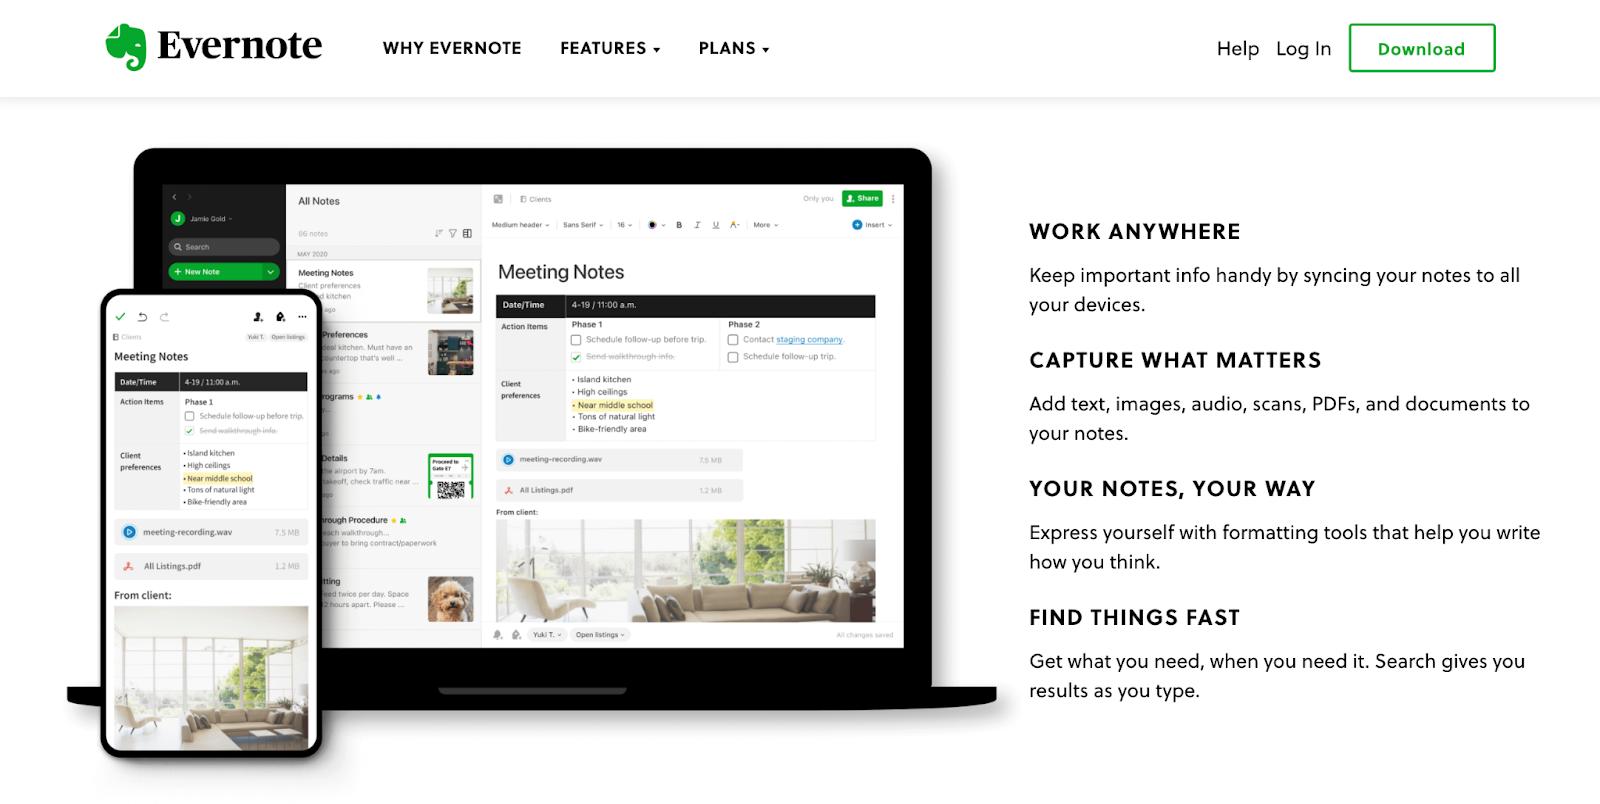 Evernote website homepage benefits